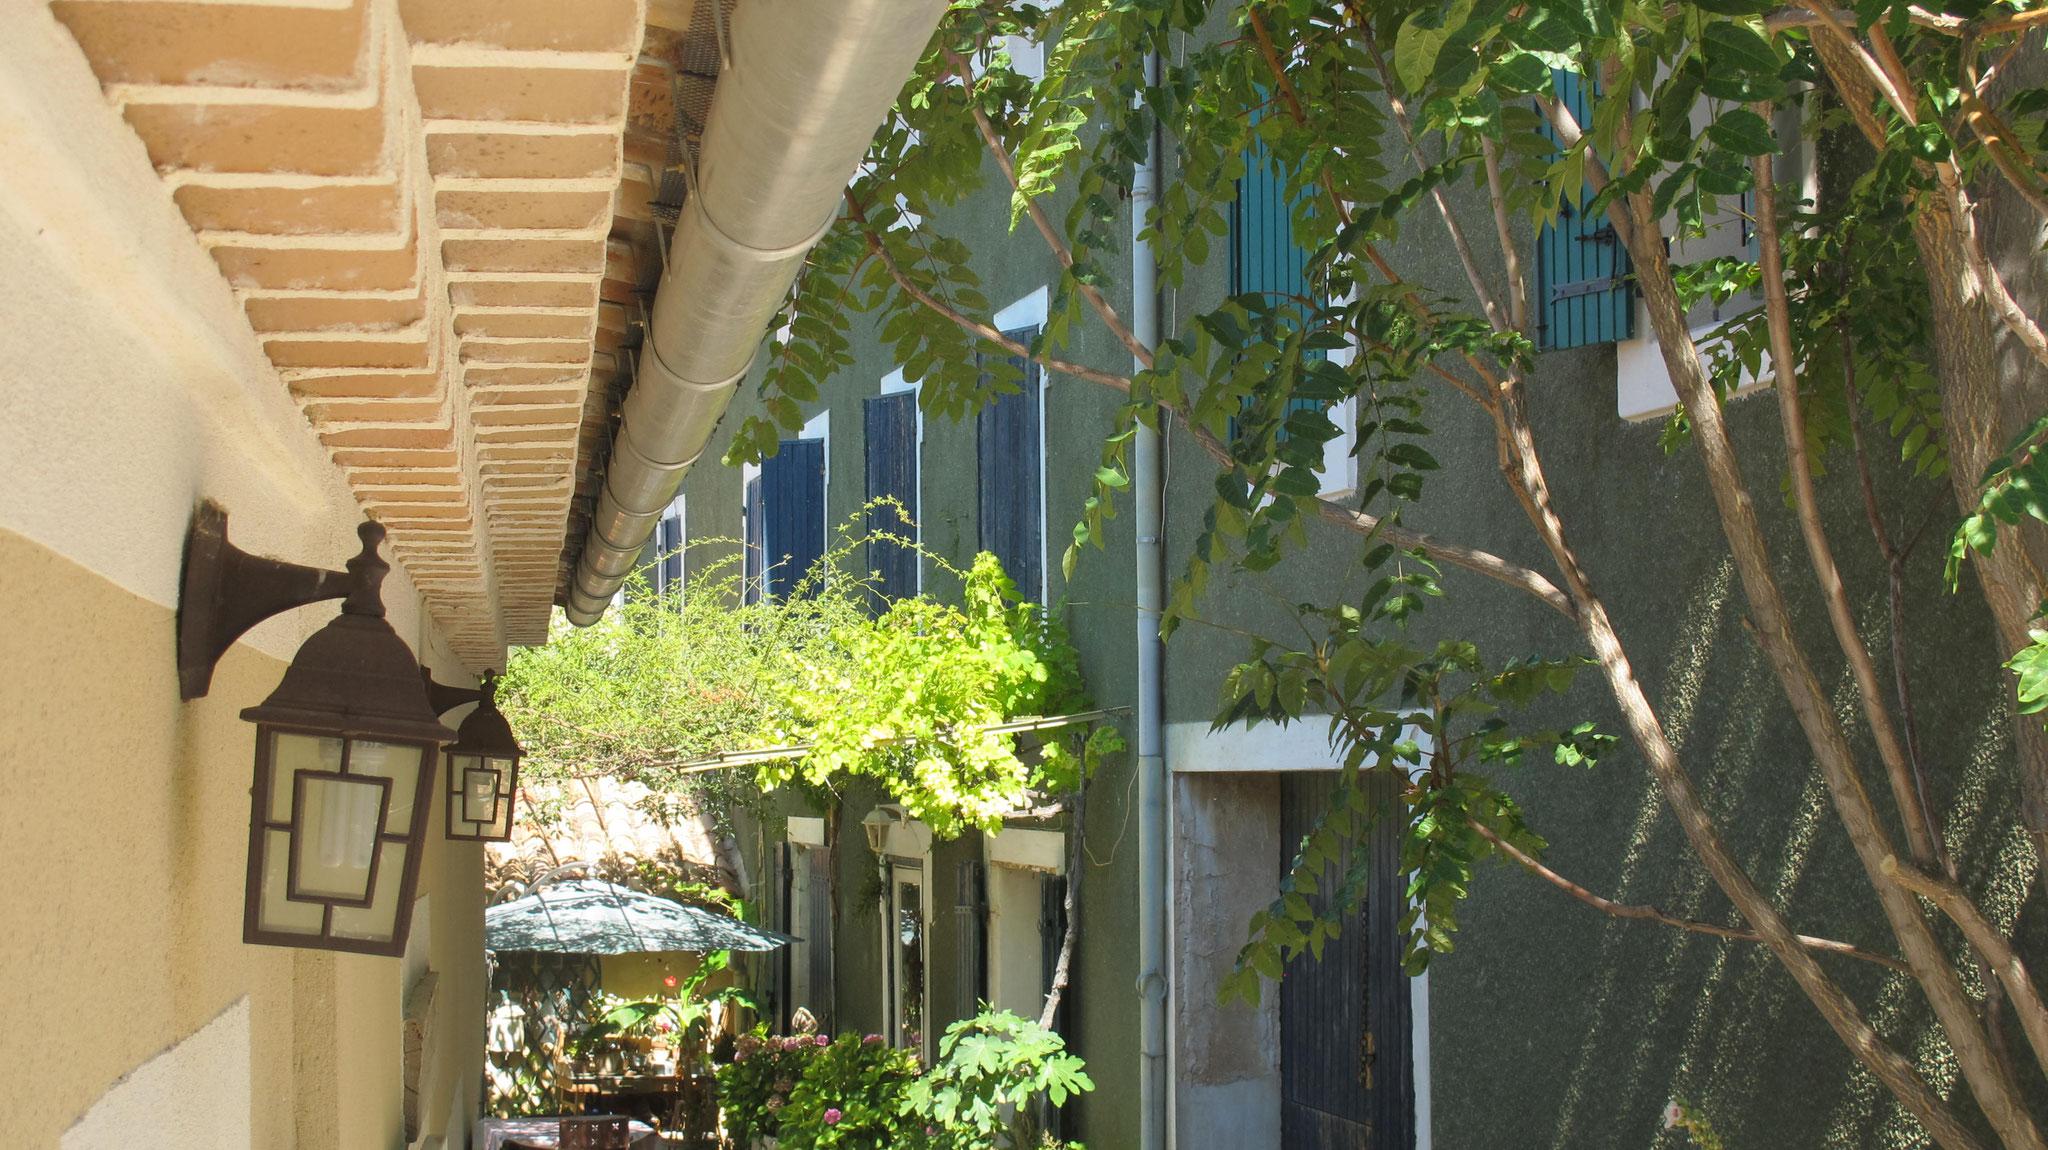 lou cardalines-hébergement-chambre d'hotes-bedoin-vaucluse-provence-calme